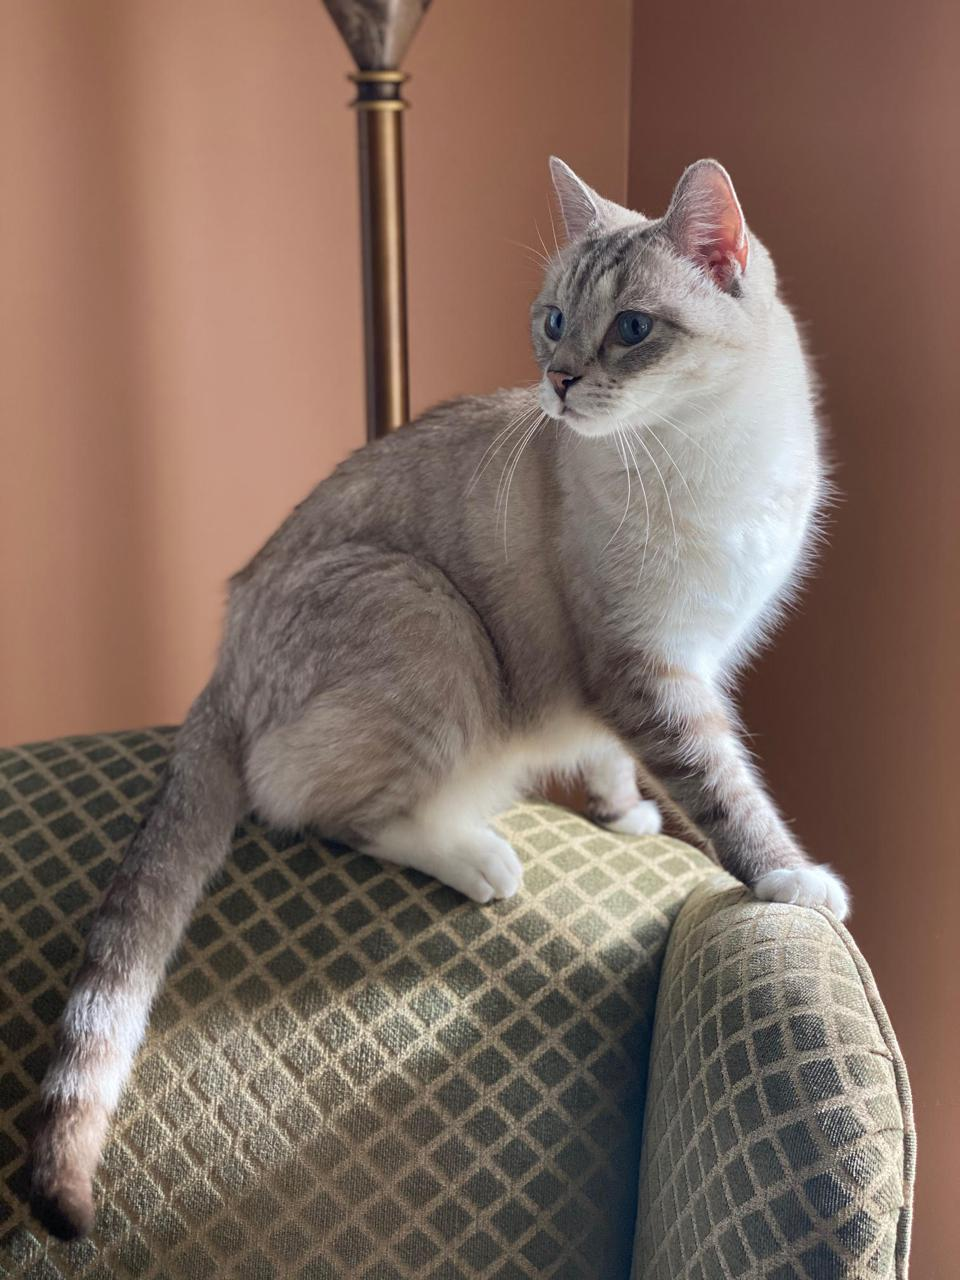 Cat, named zoloft